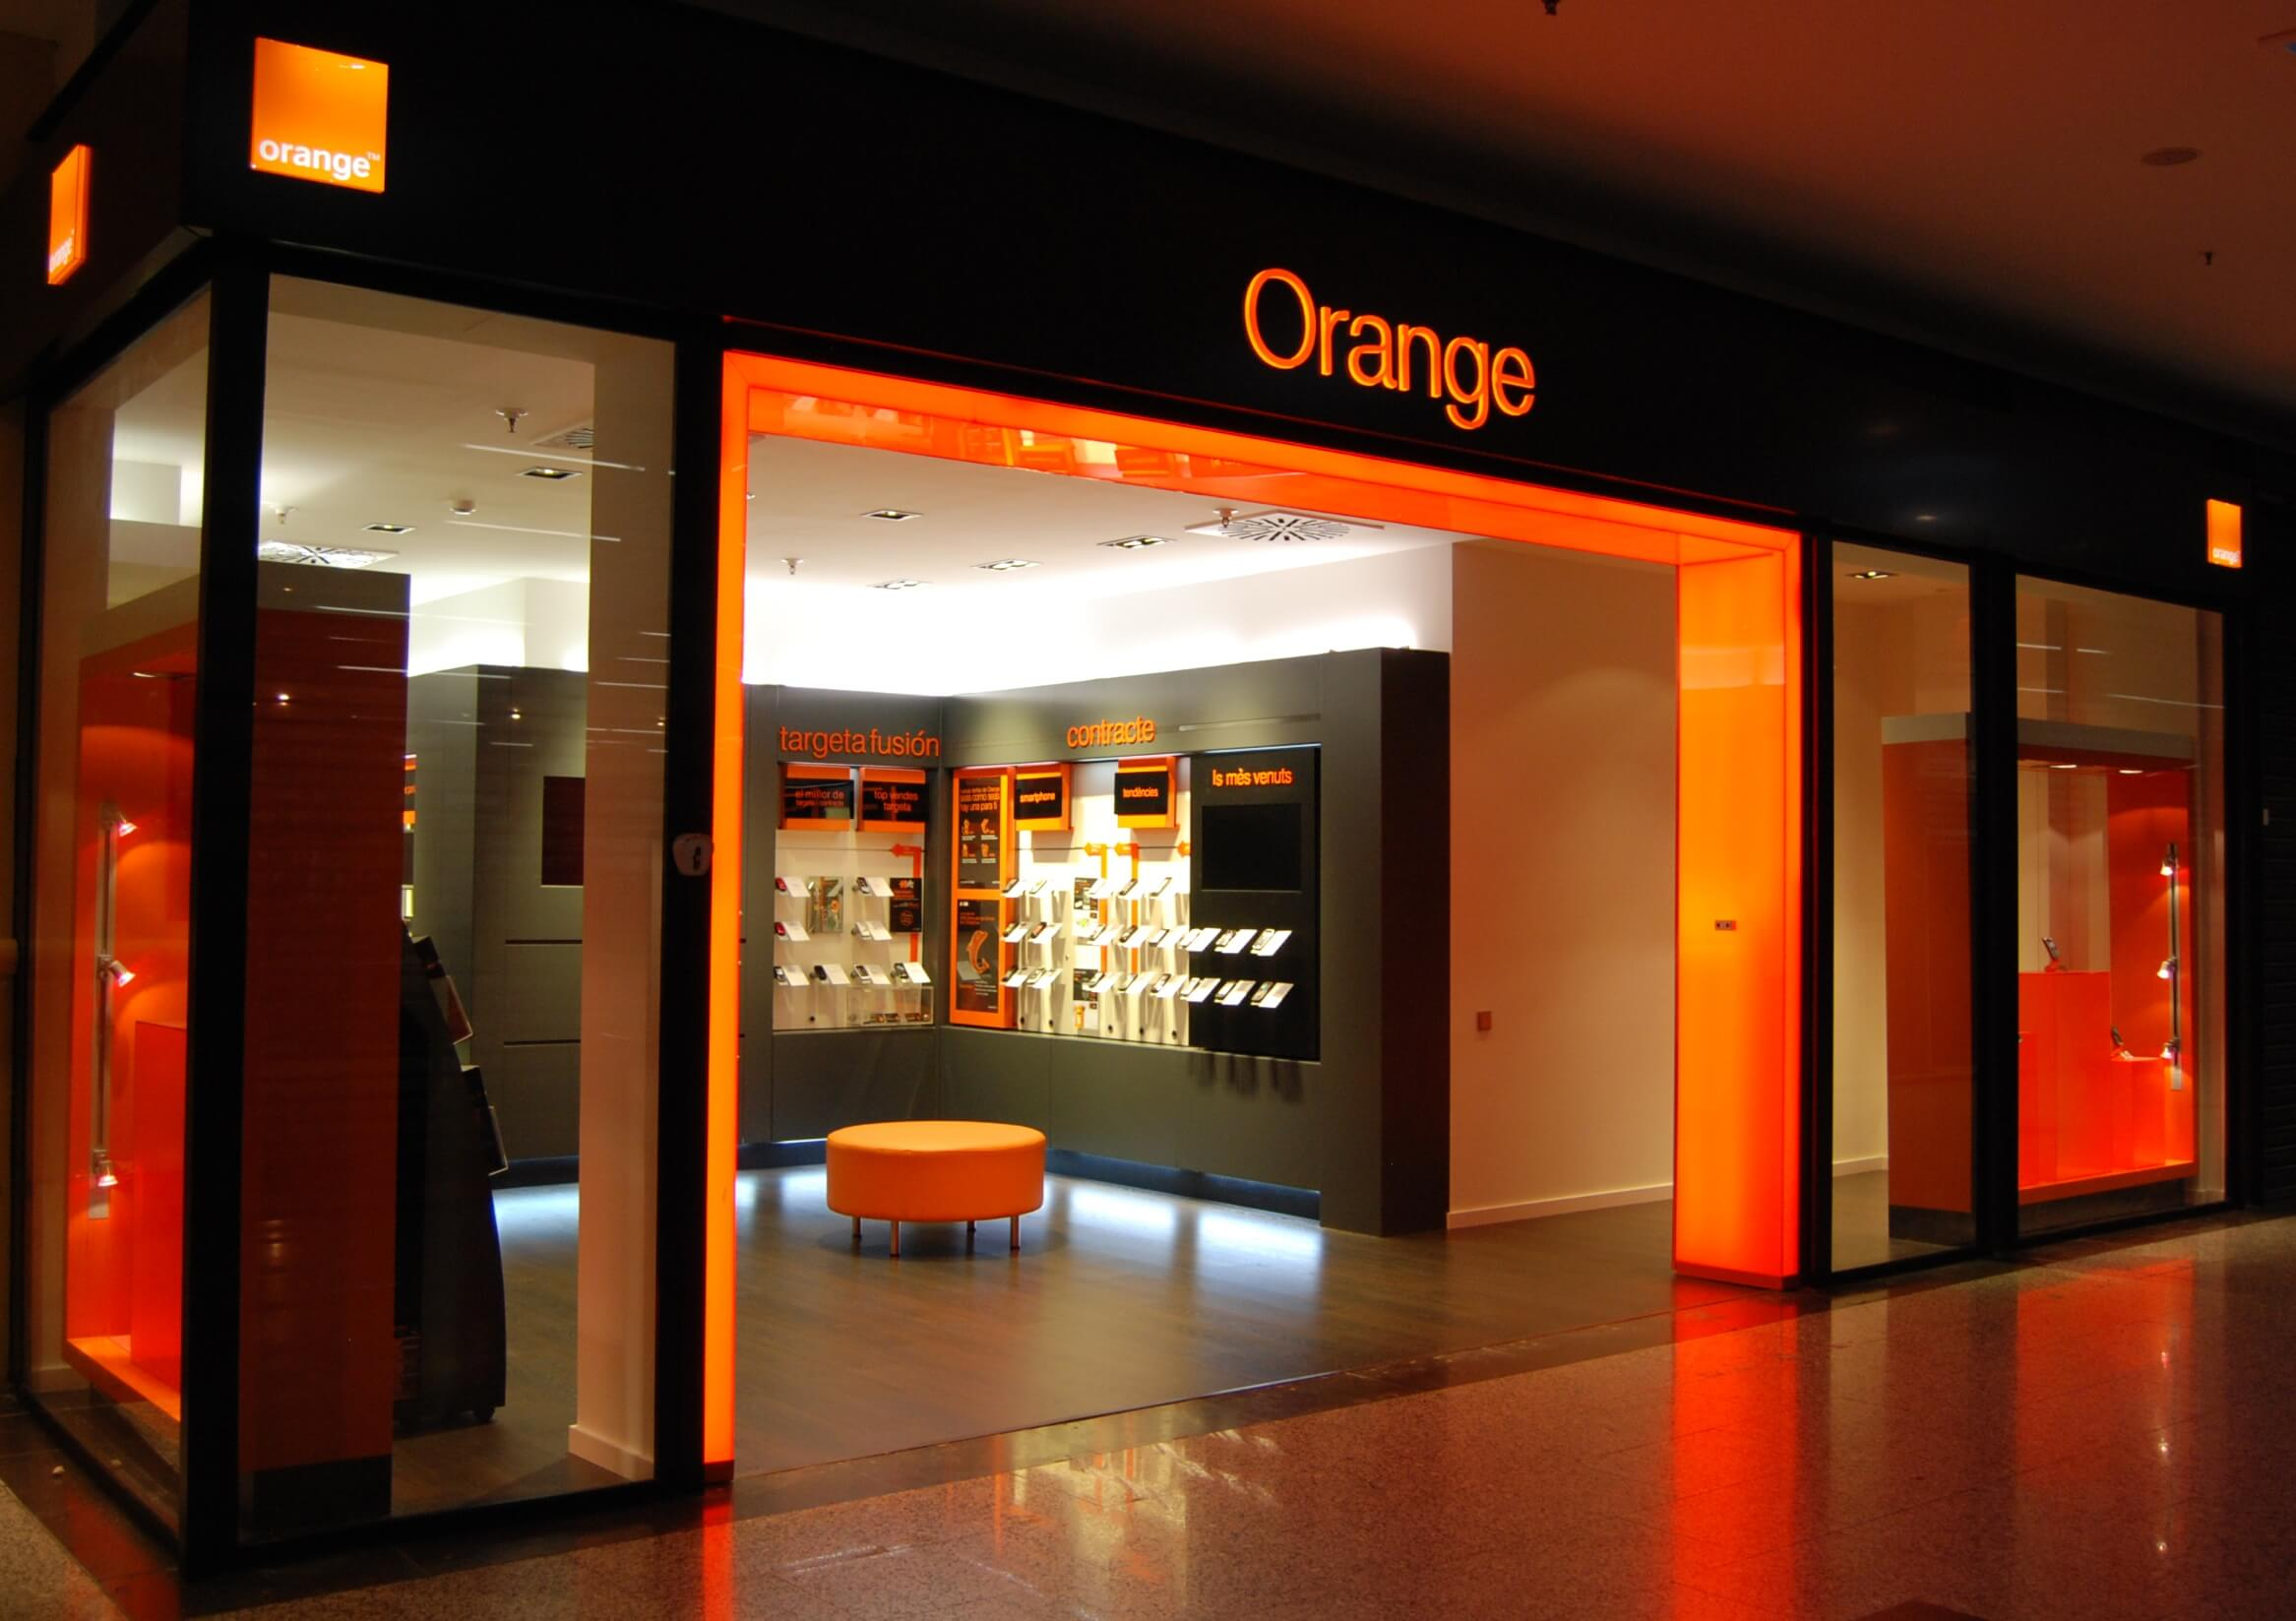 cómo renovar mi movil con Orange